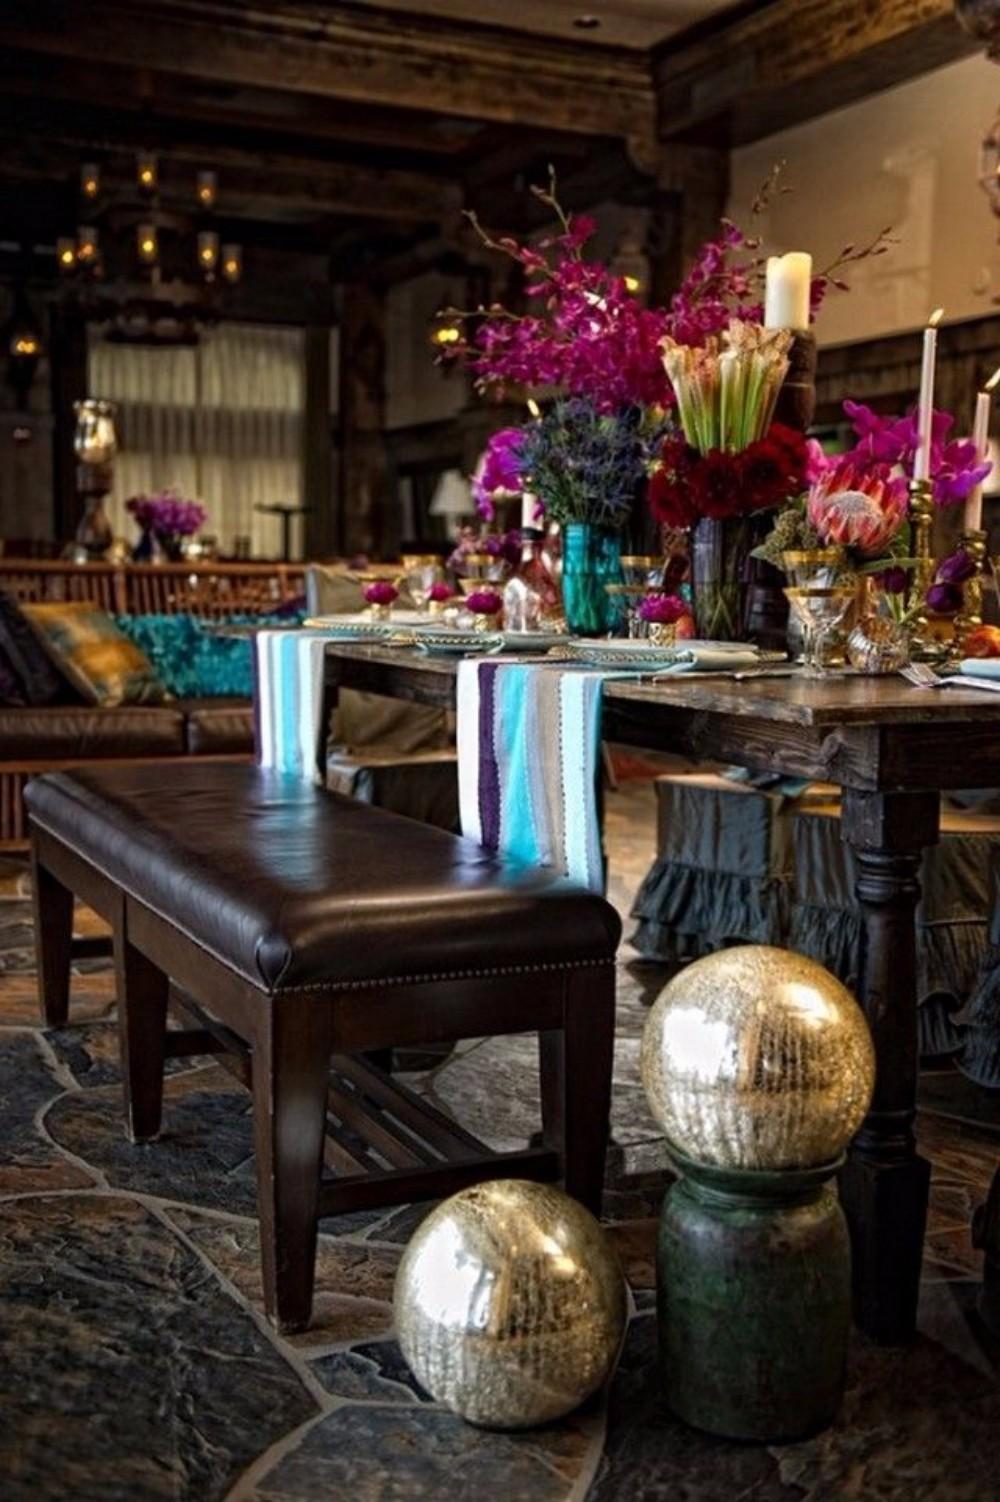 boho chic 25 Boho Chic Dining Room Designs That Will Inspire You 25 boho chic dining room designs that will inspire you 13